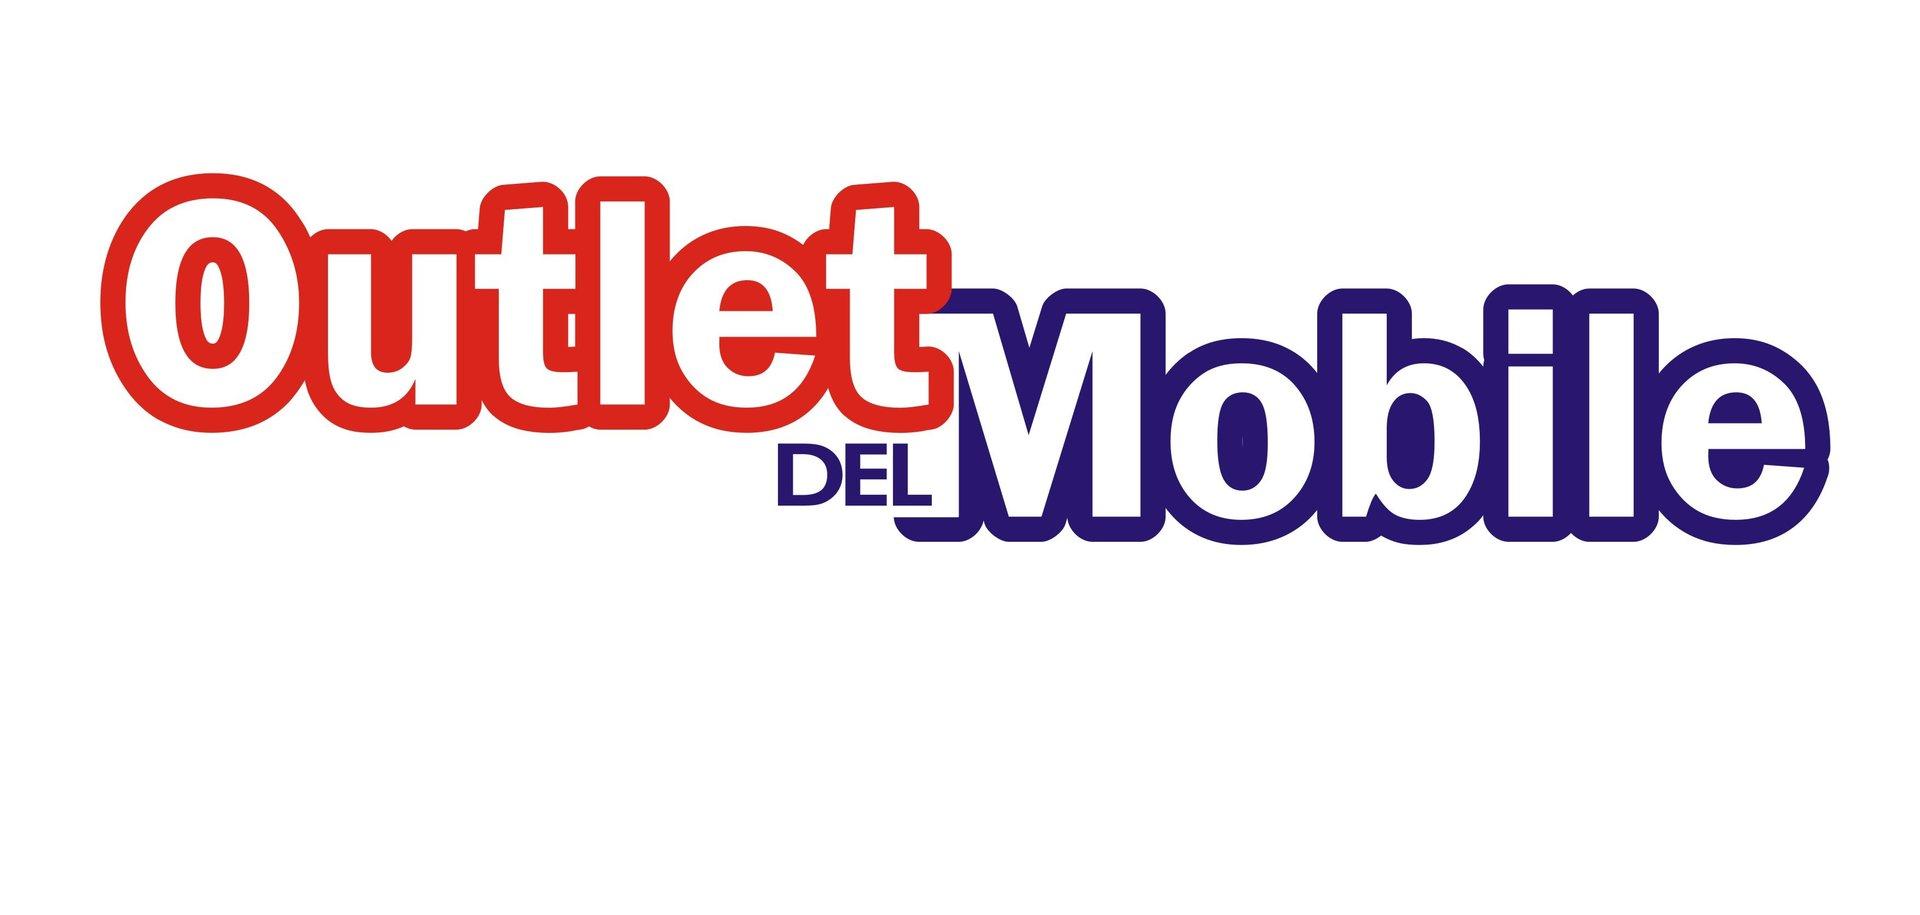 Beautiful Outlet Del Mobile Online Images - Ameripest.us ...